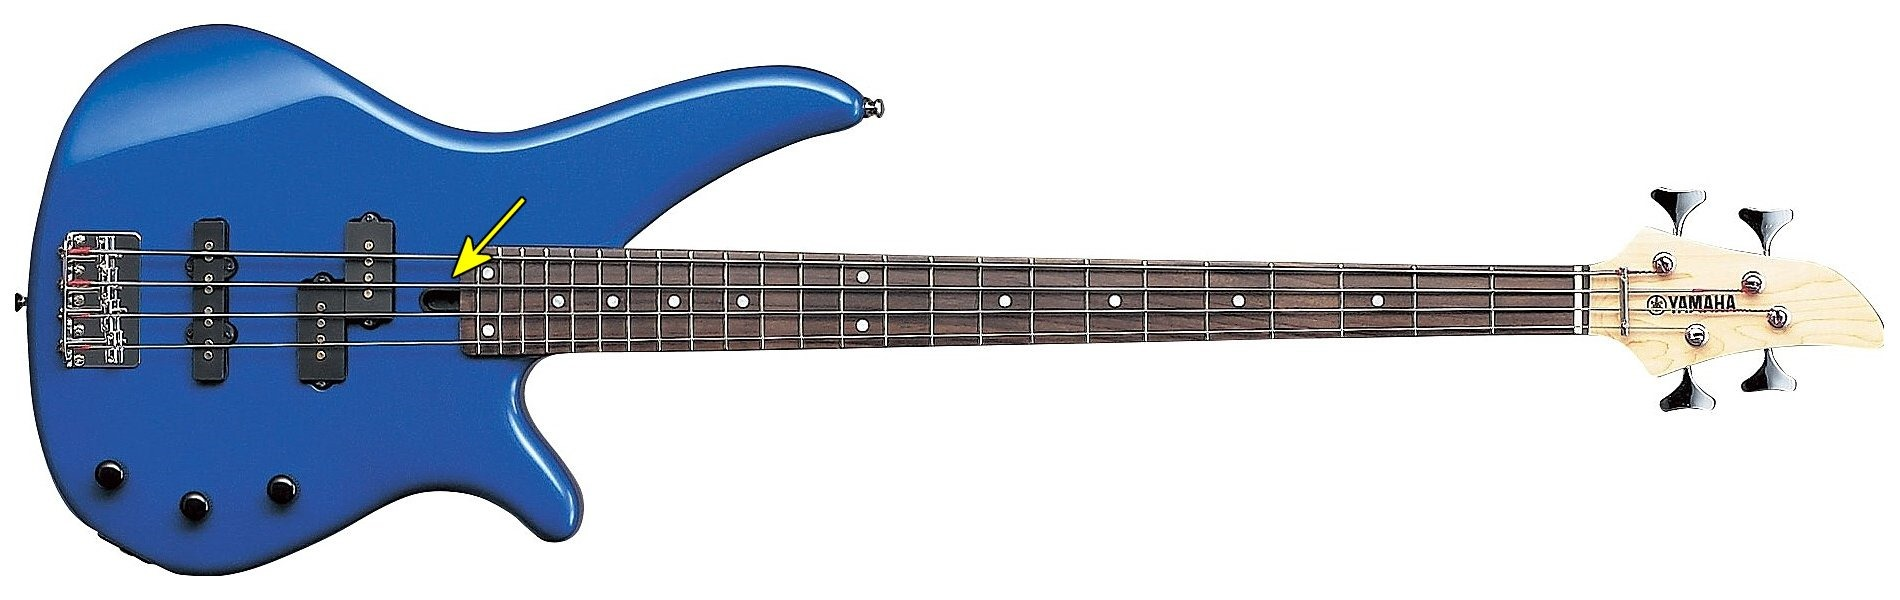 Yamaha RBX170